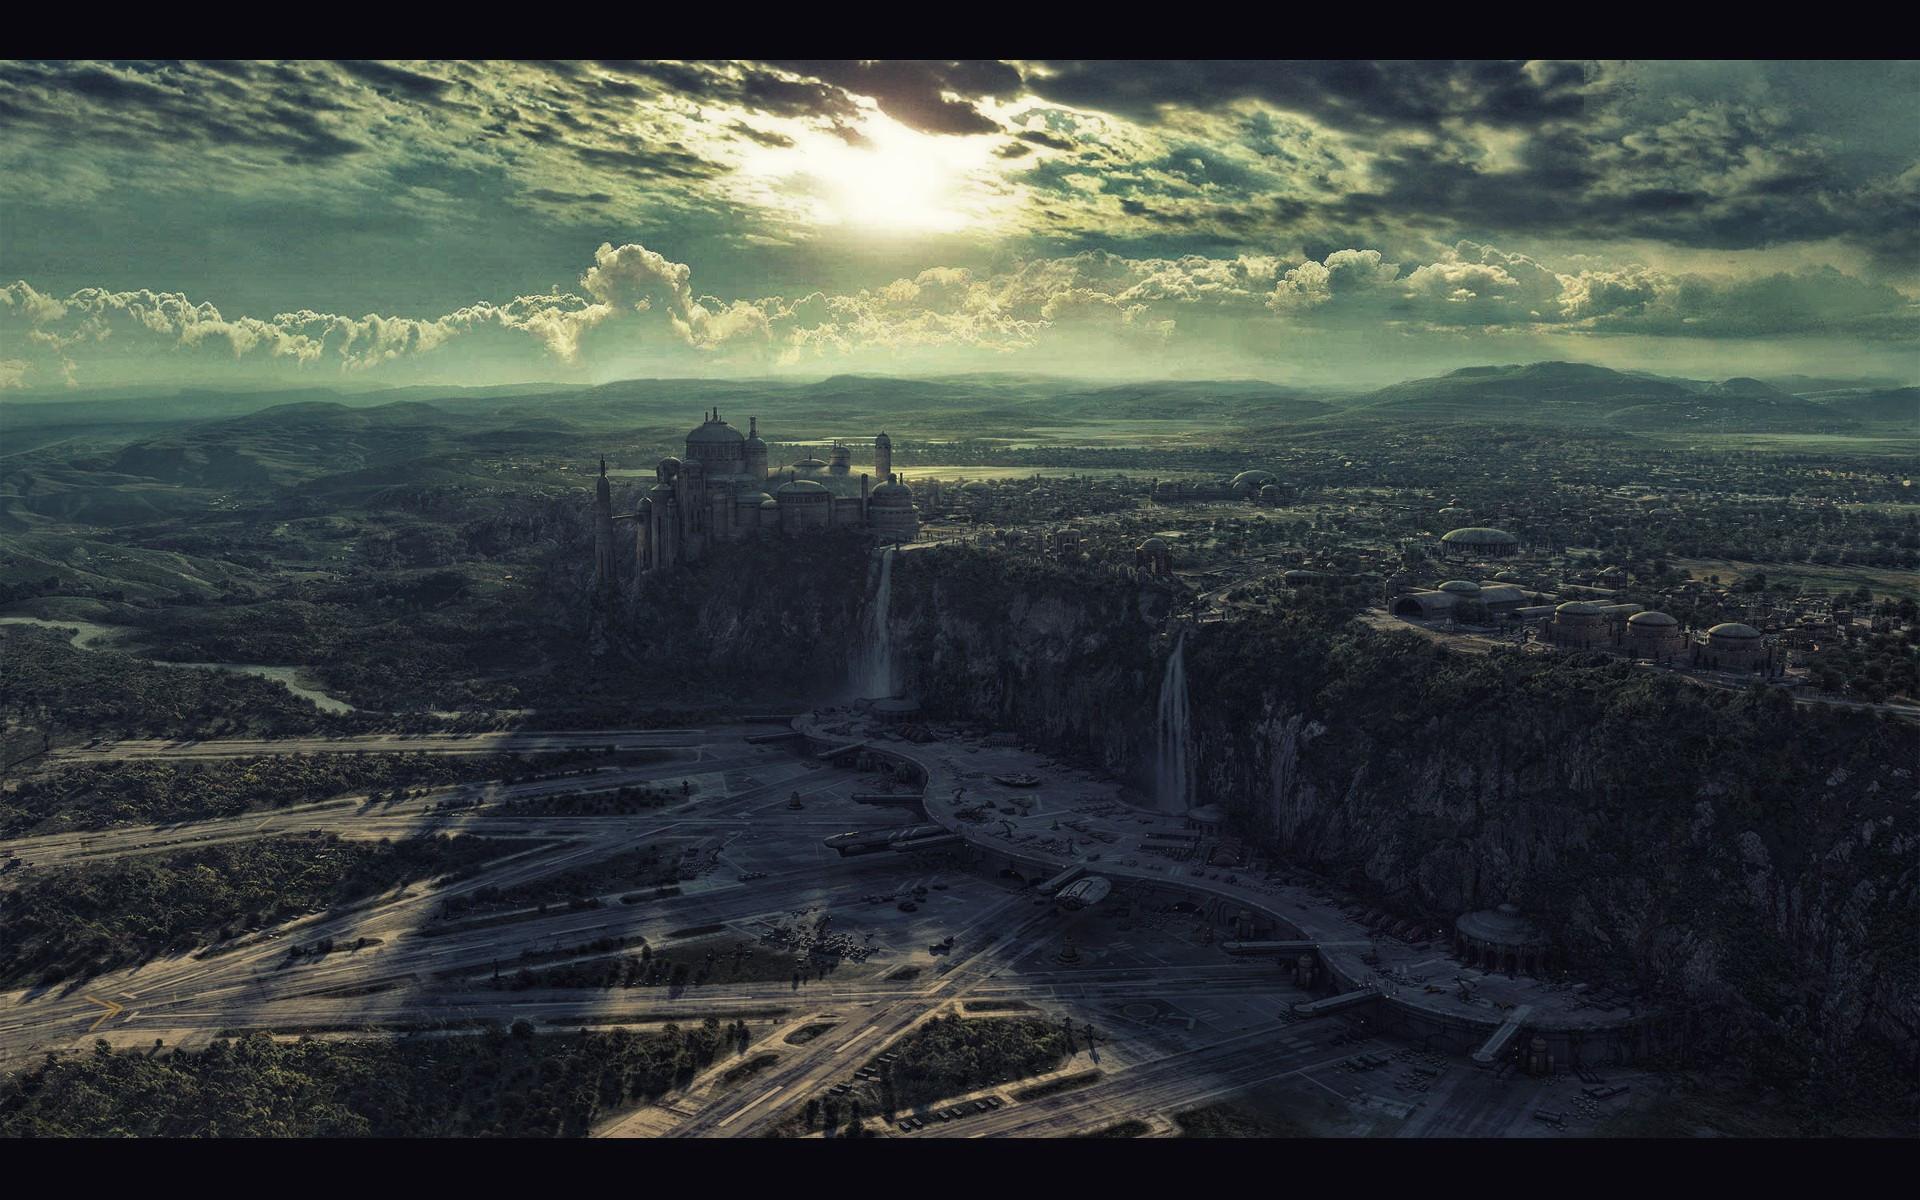 Best ideas about Star Wars Landscape . Save or Pin Star Wars Landscape Wallpaper WallpaperSafari Now.